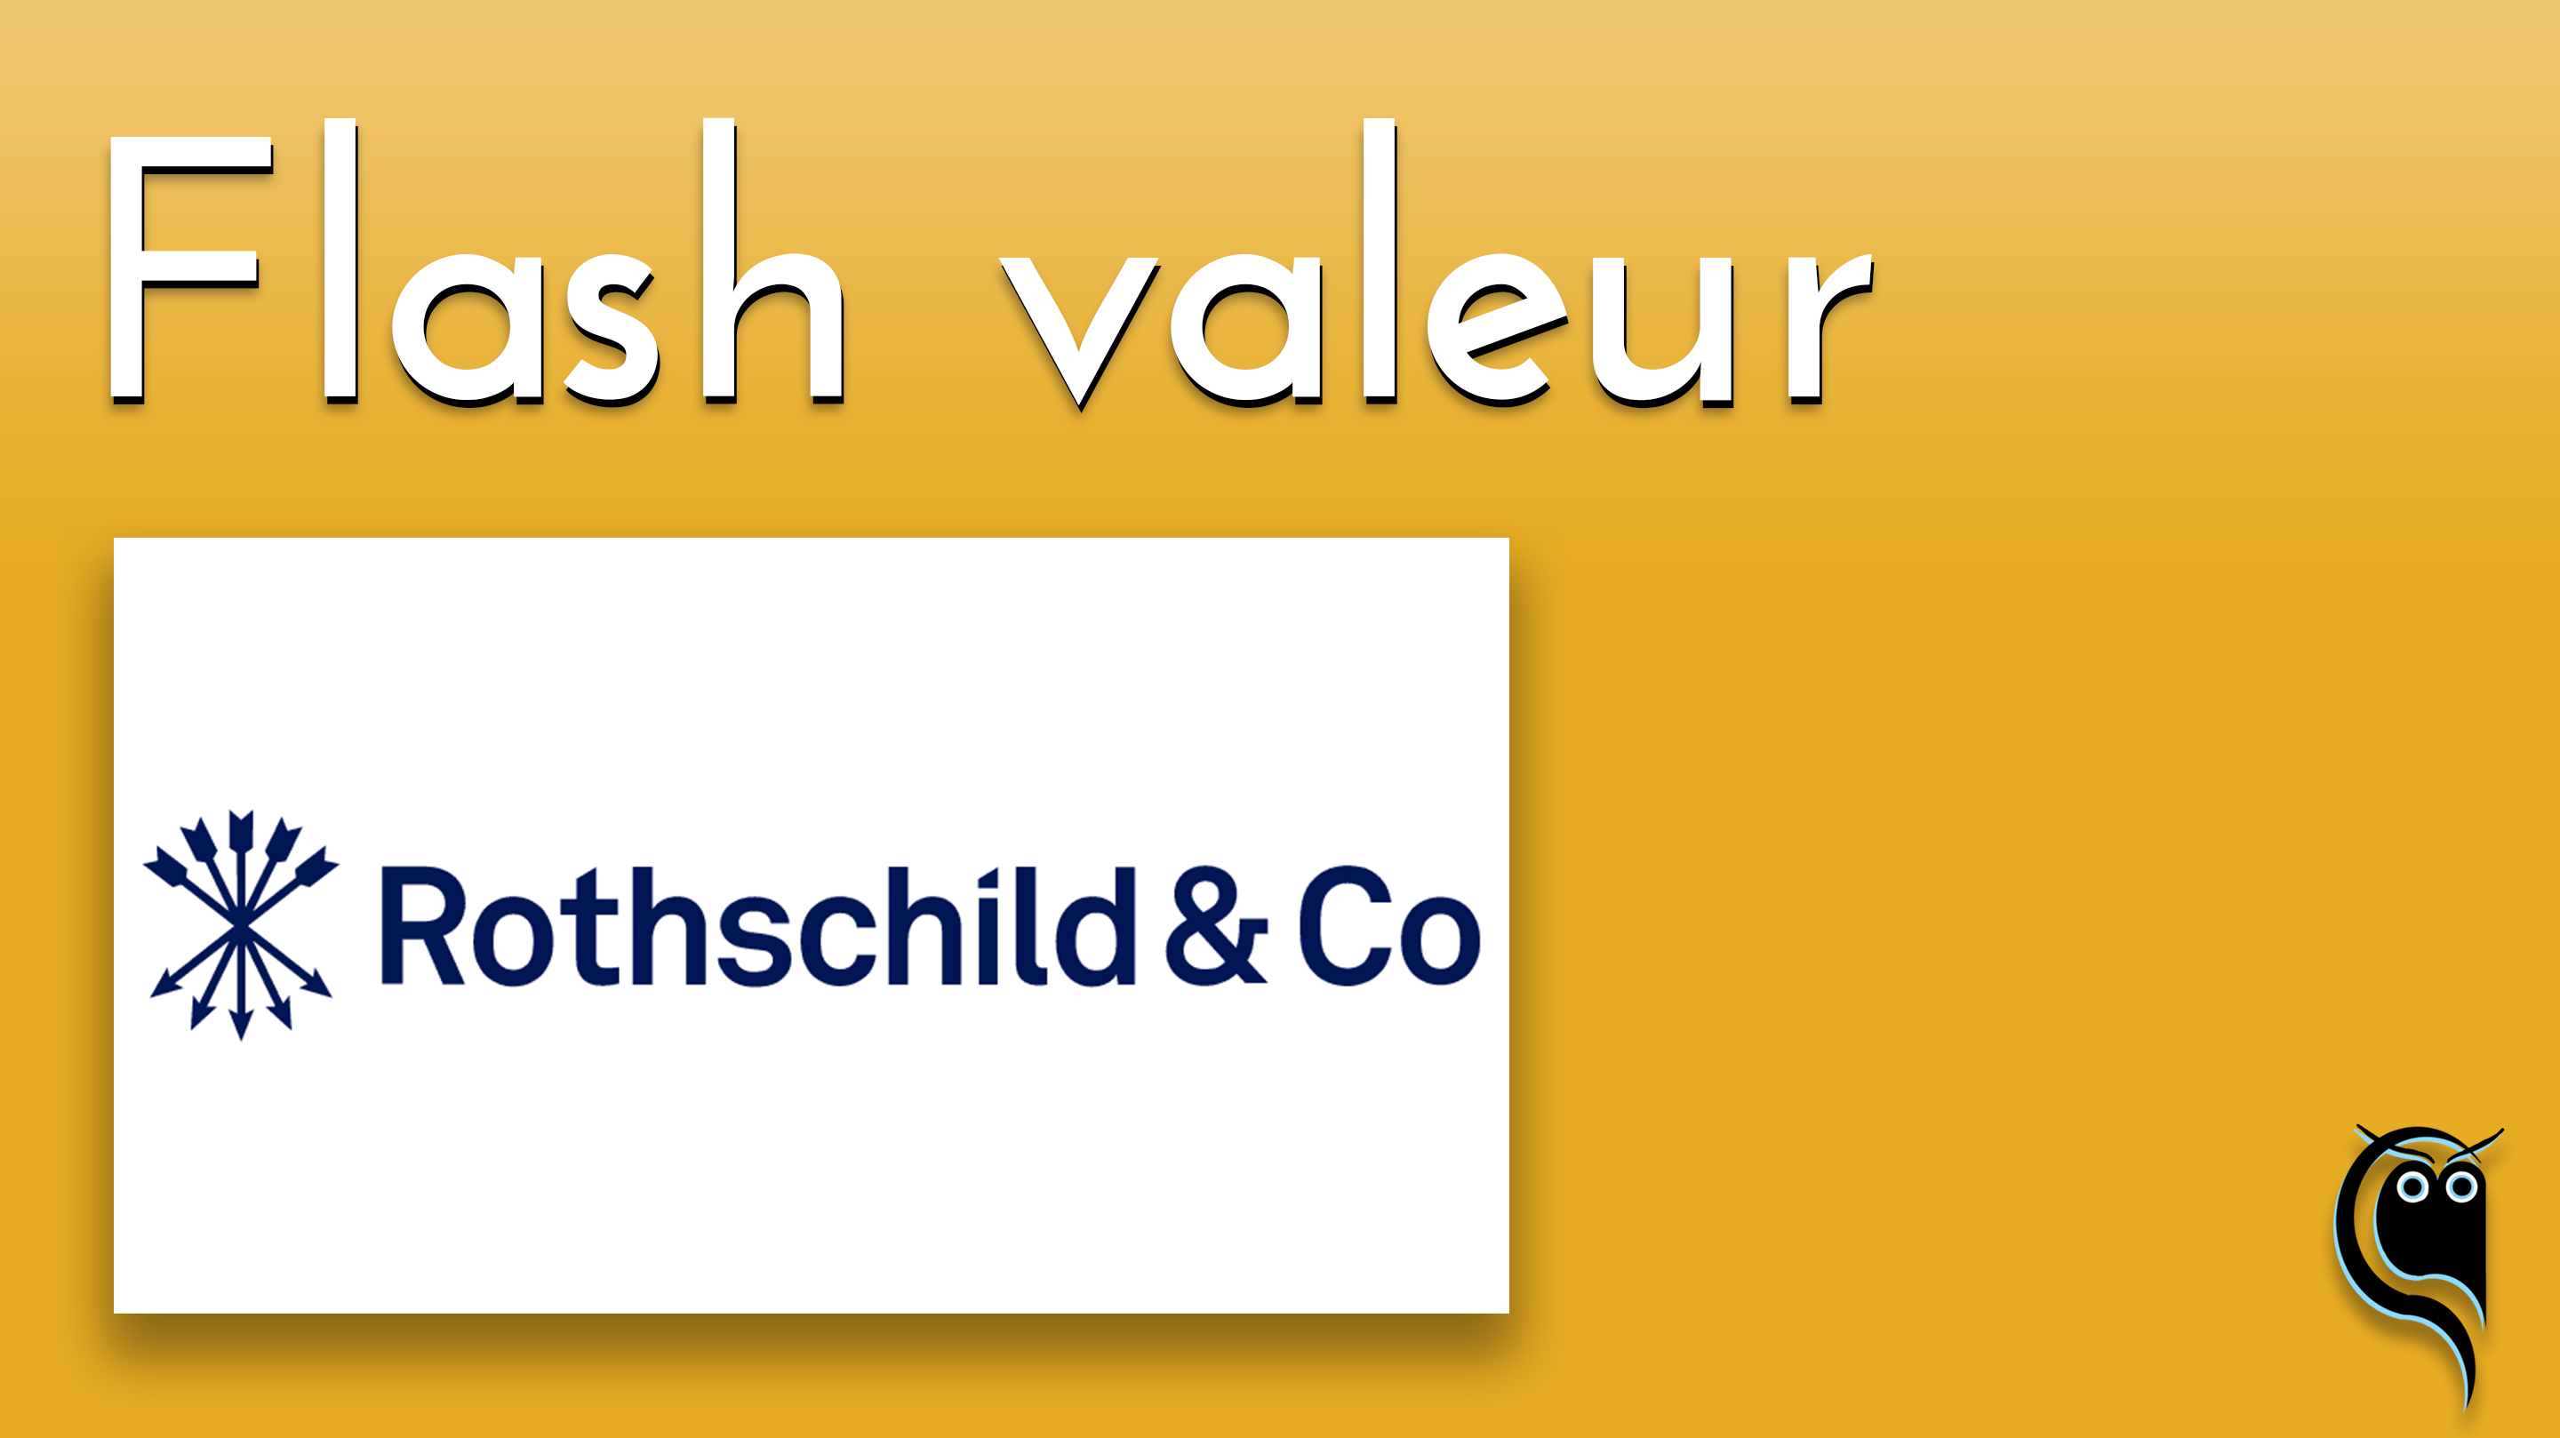 Flash Rothschild - résultats 1er trimestre 2021